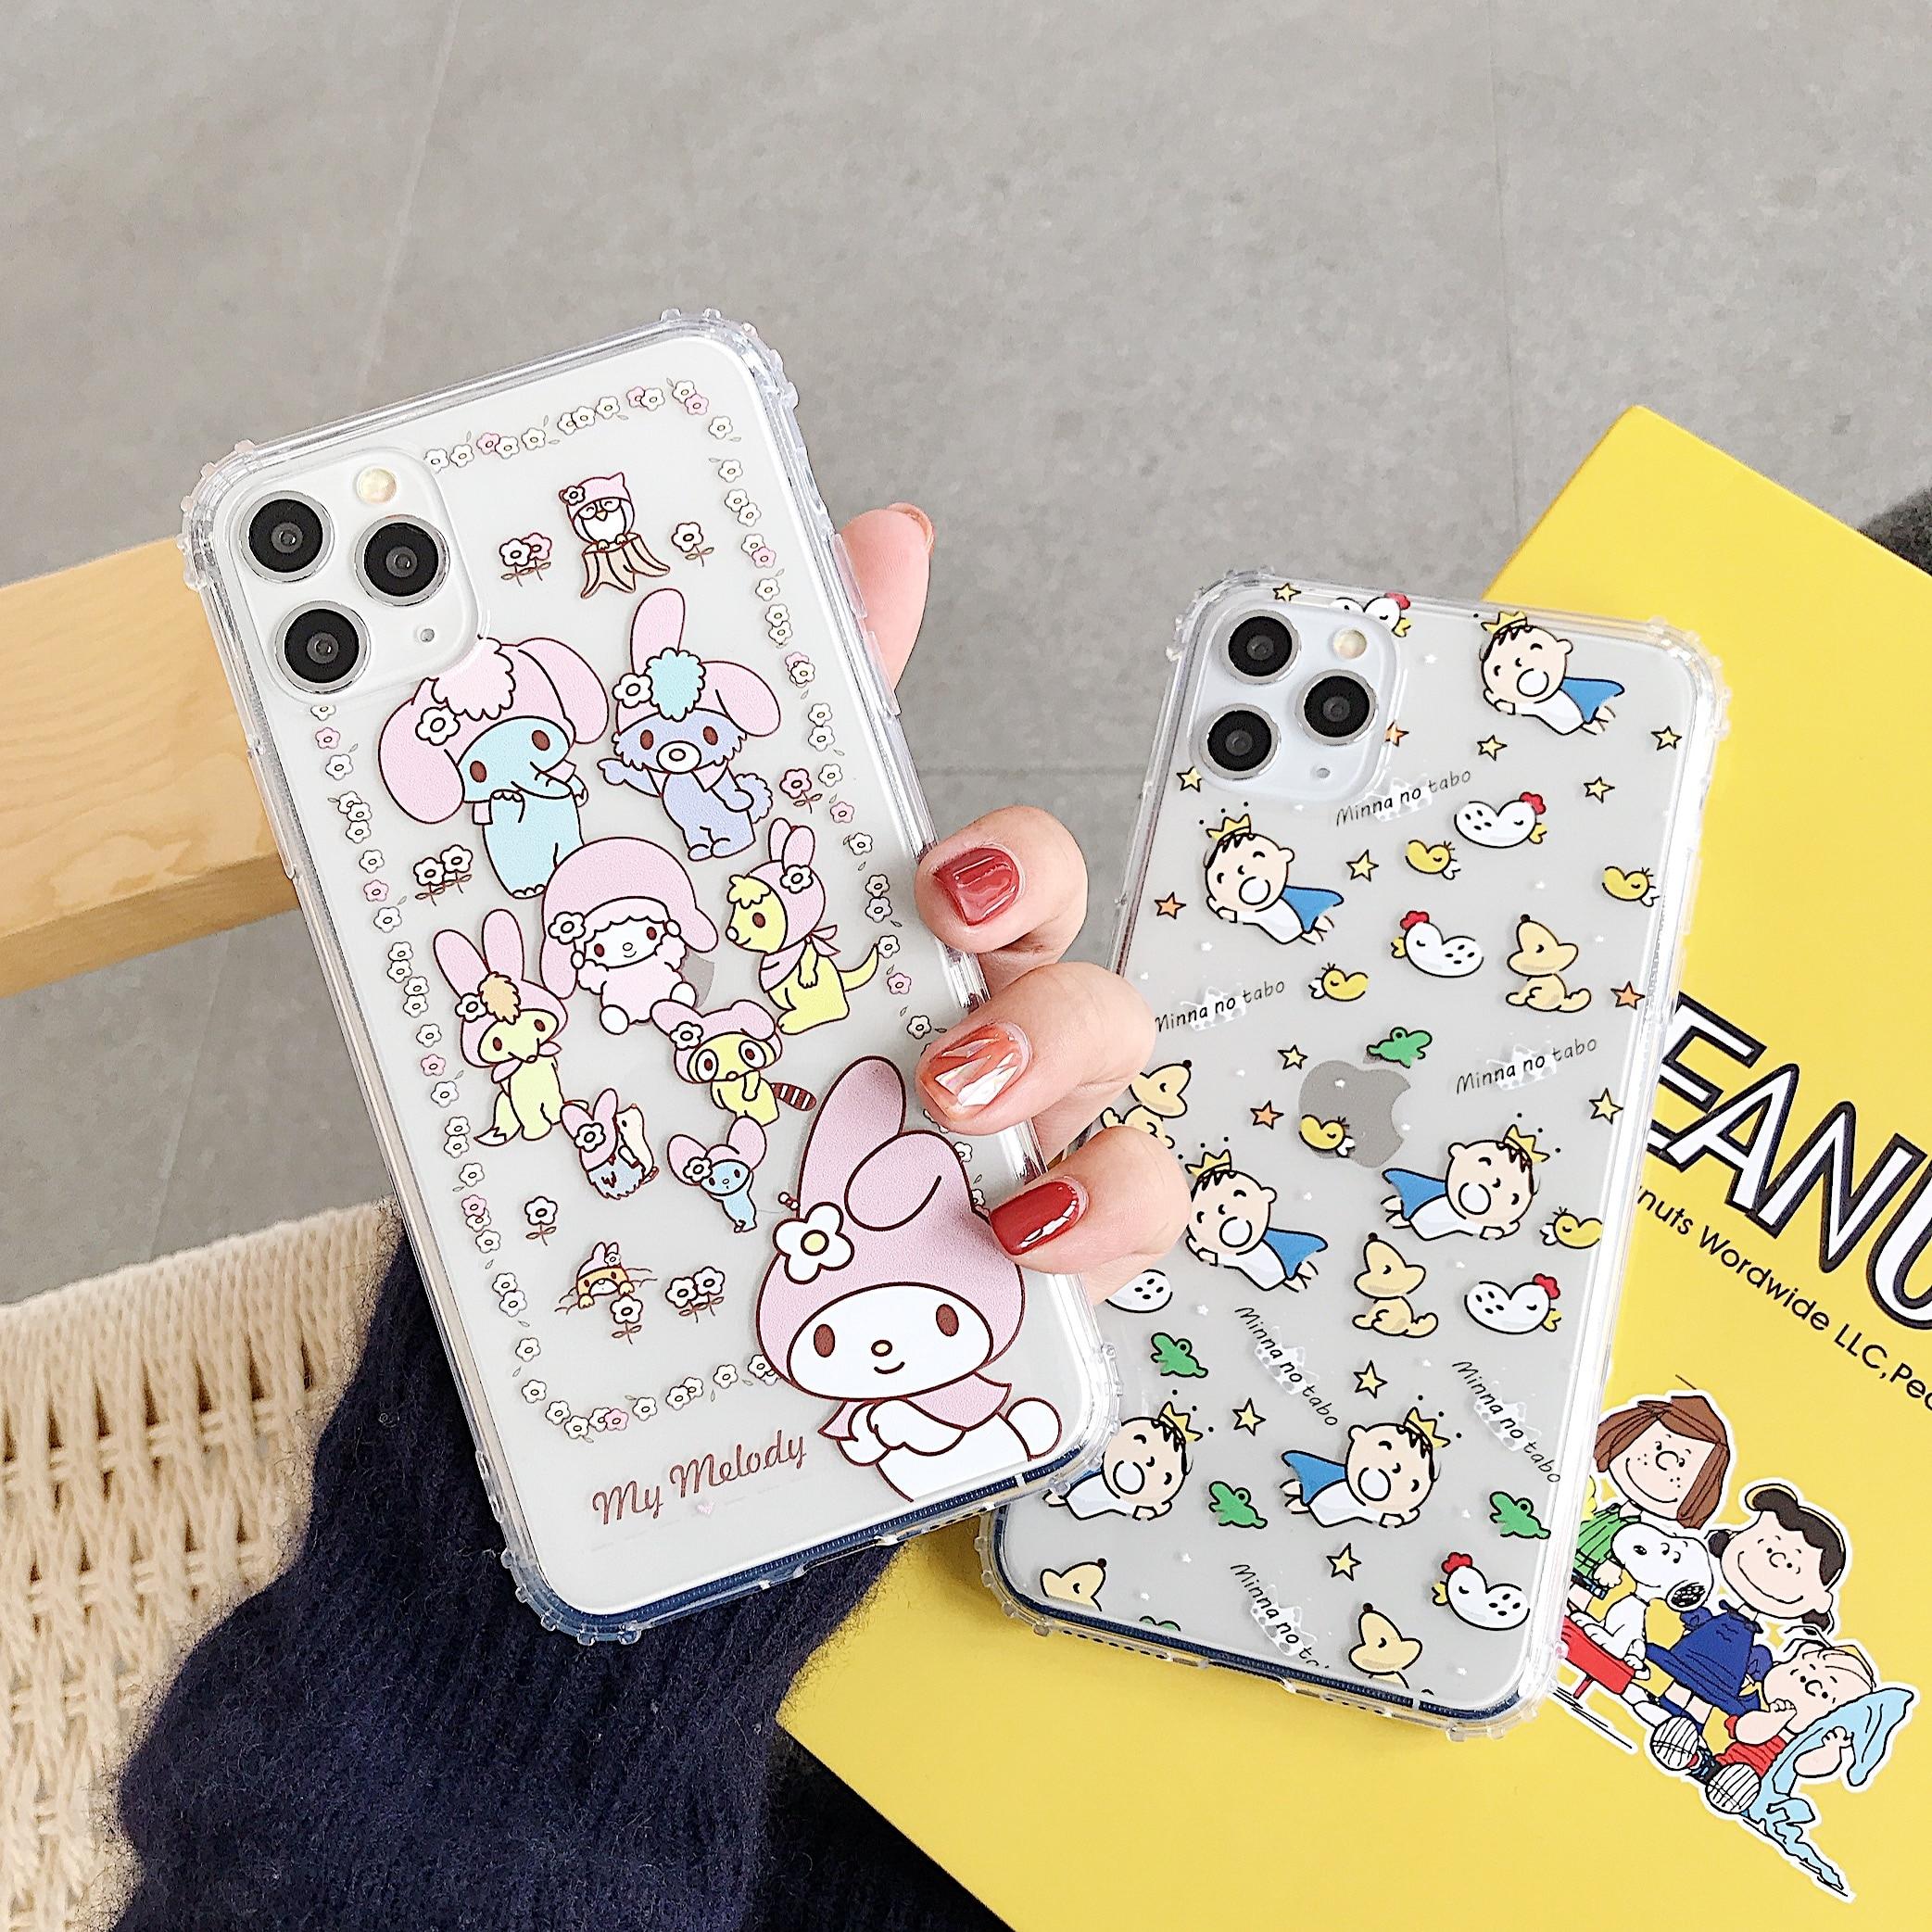 2020 nueva llegada Melody Cinnamoroll perro muñeca teléfono caso para iphone 11 Pro Max casos TPU suave para iphone XR XS MAX X 7 8 plus